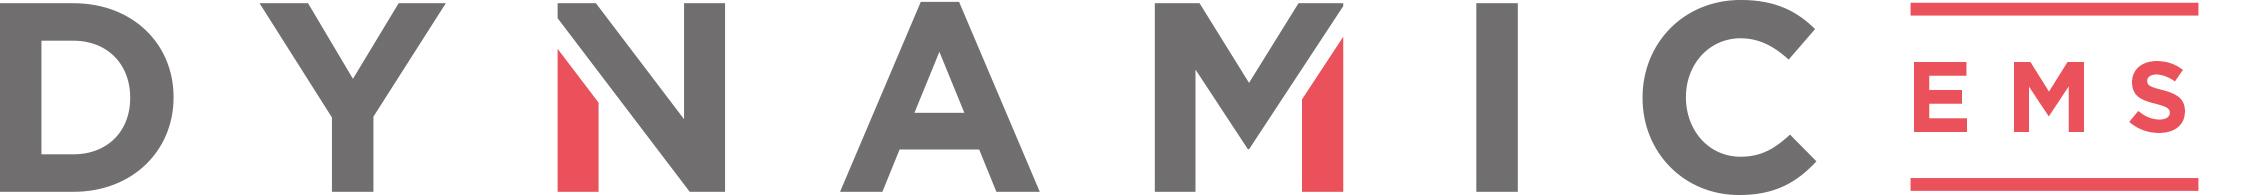 DynamicEMS-Logo